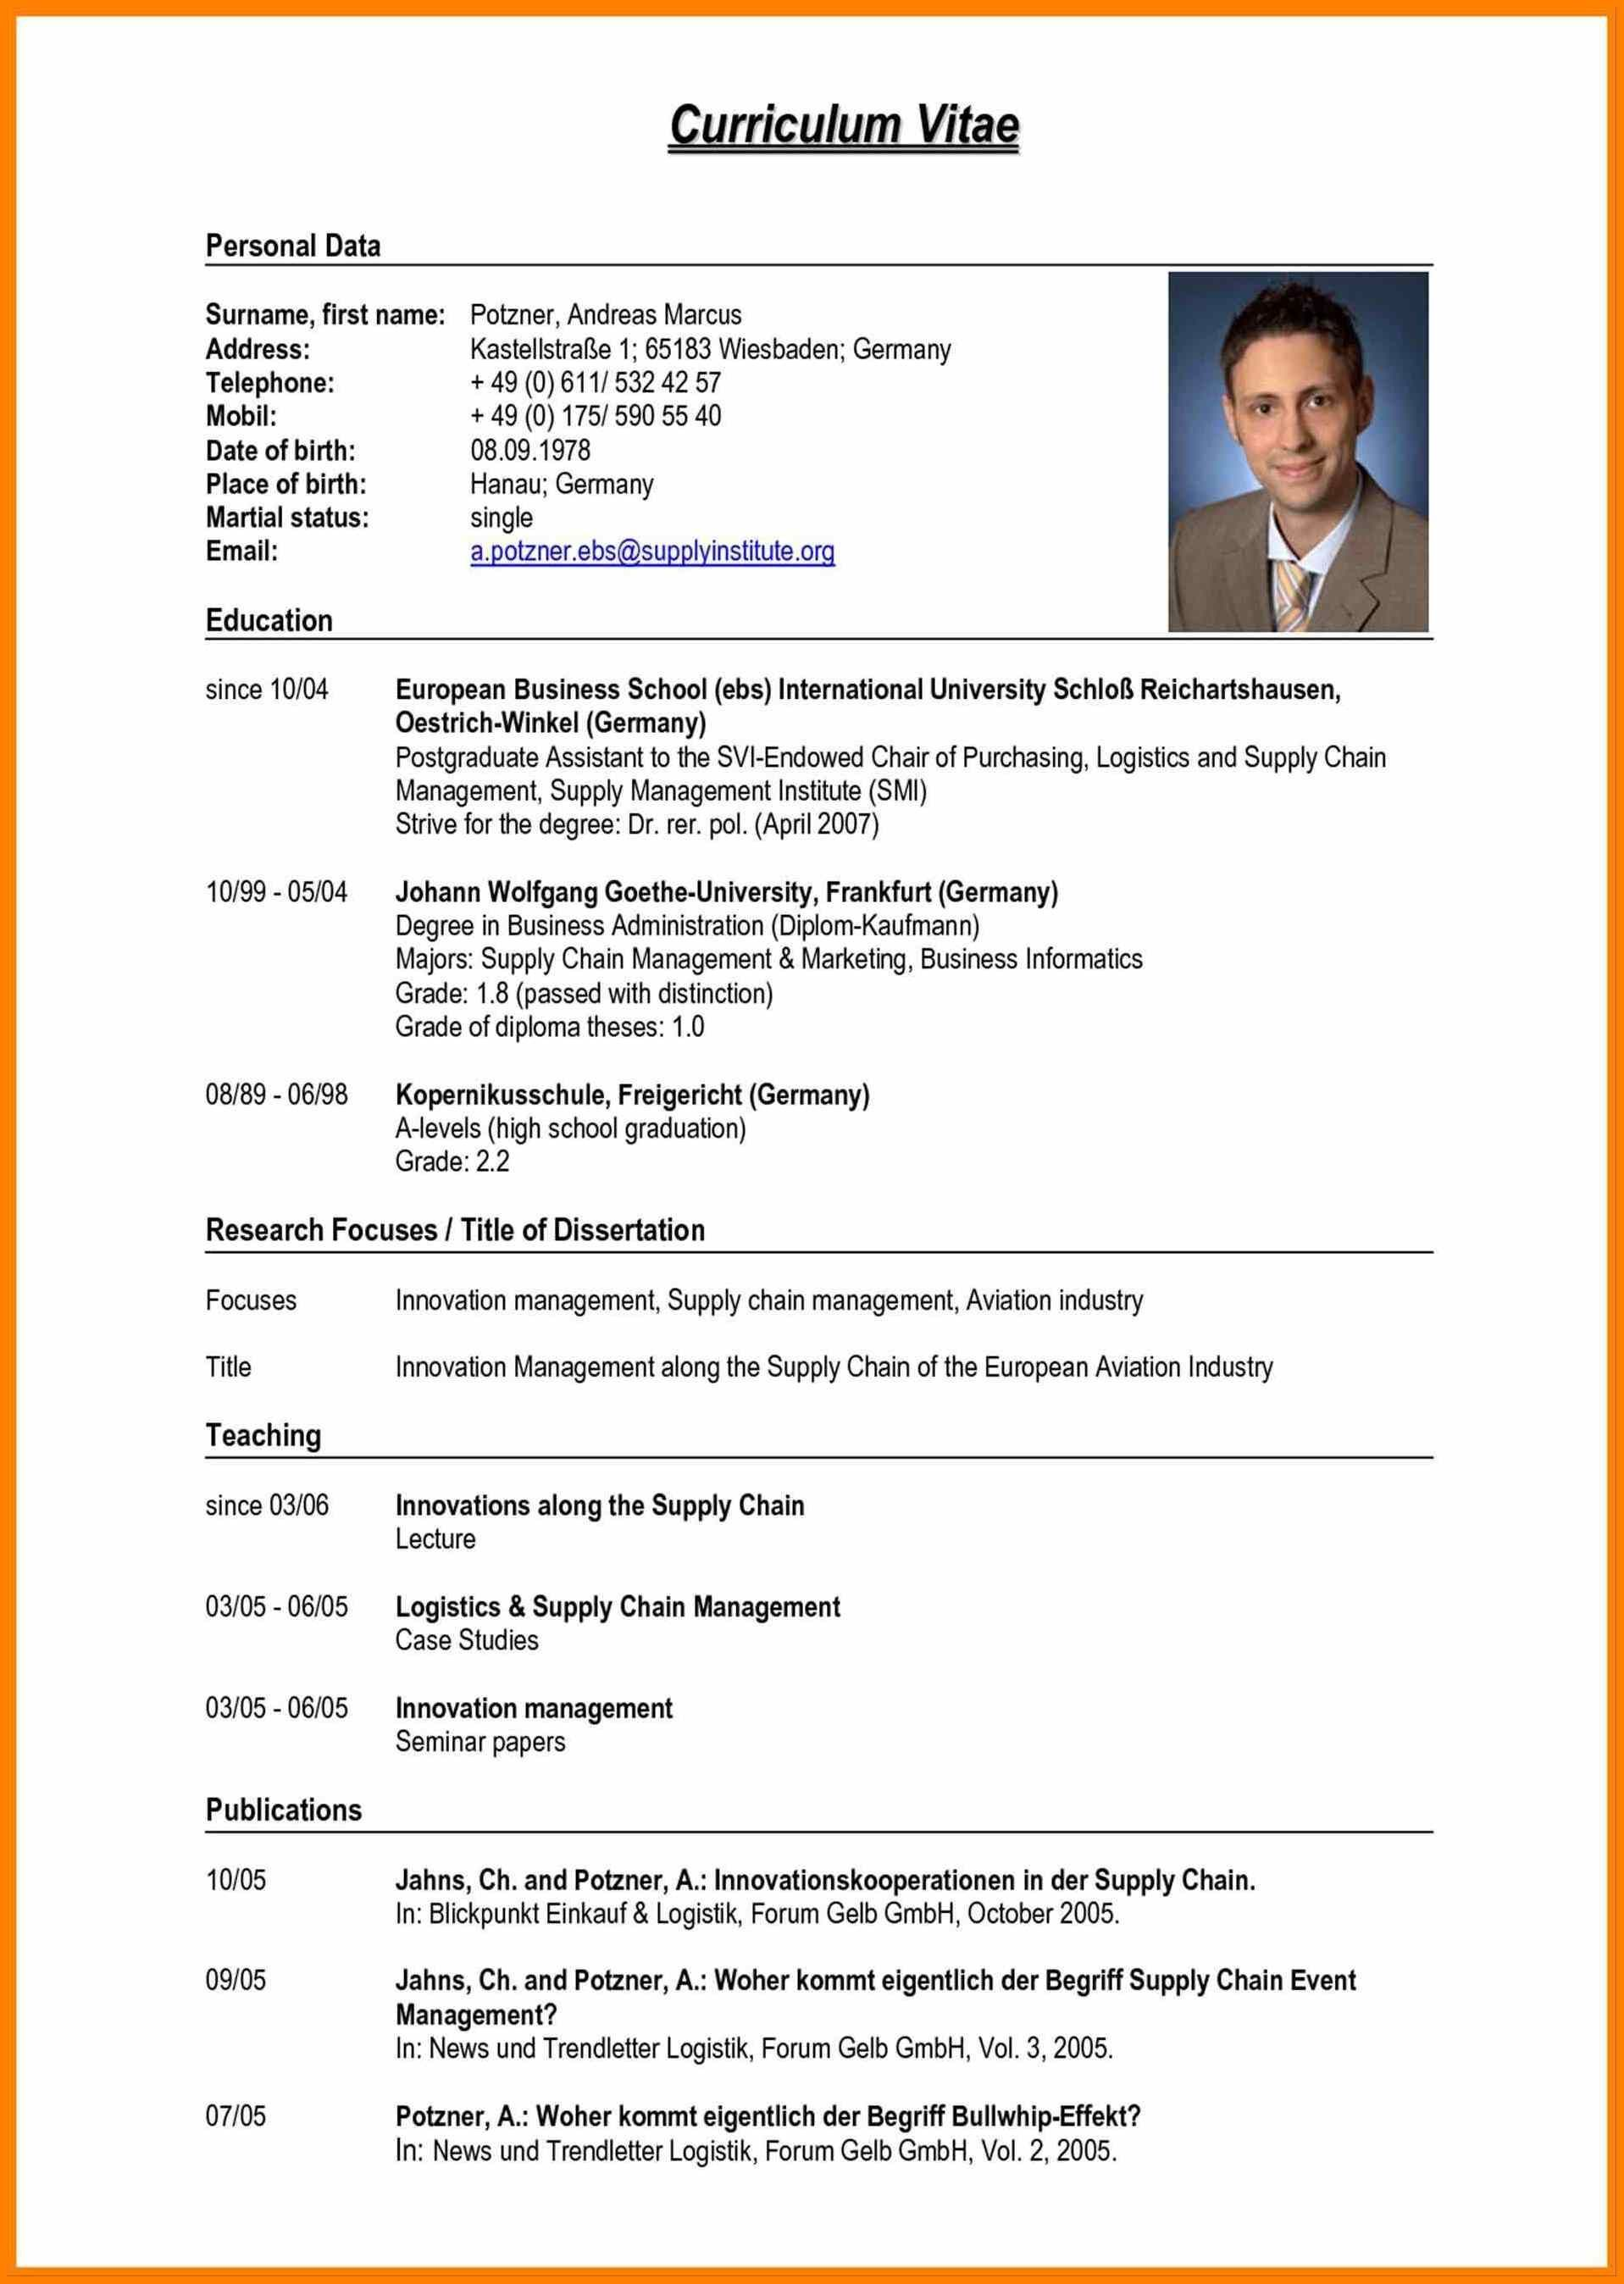 8 Sample Of Curriculum Vitae For Job Application Pdf Edu Techation Fifa Curriculum Vita In 2020 Curriculum Vitae Format Curriculum Vitae Template Job Resume Format